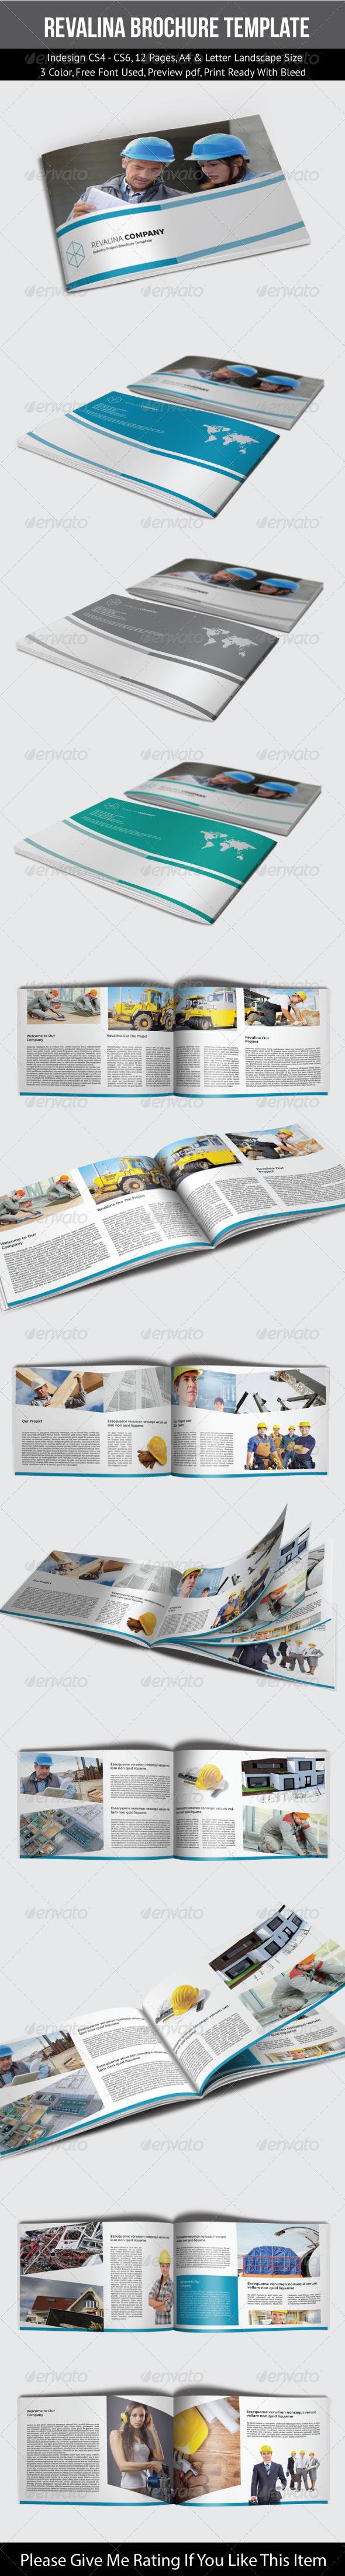 Revalina Corporate Brochure Template